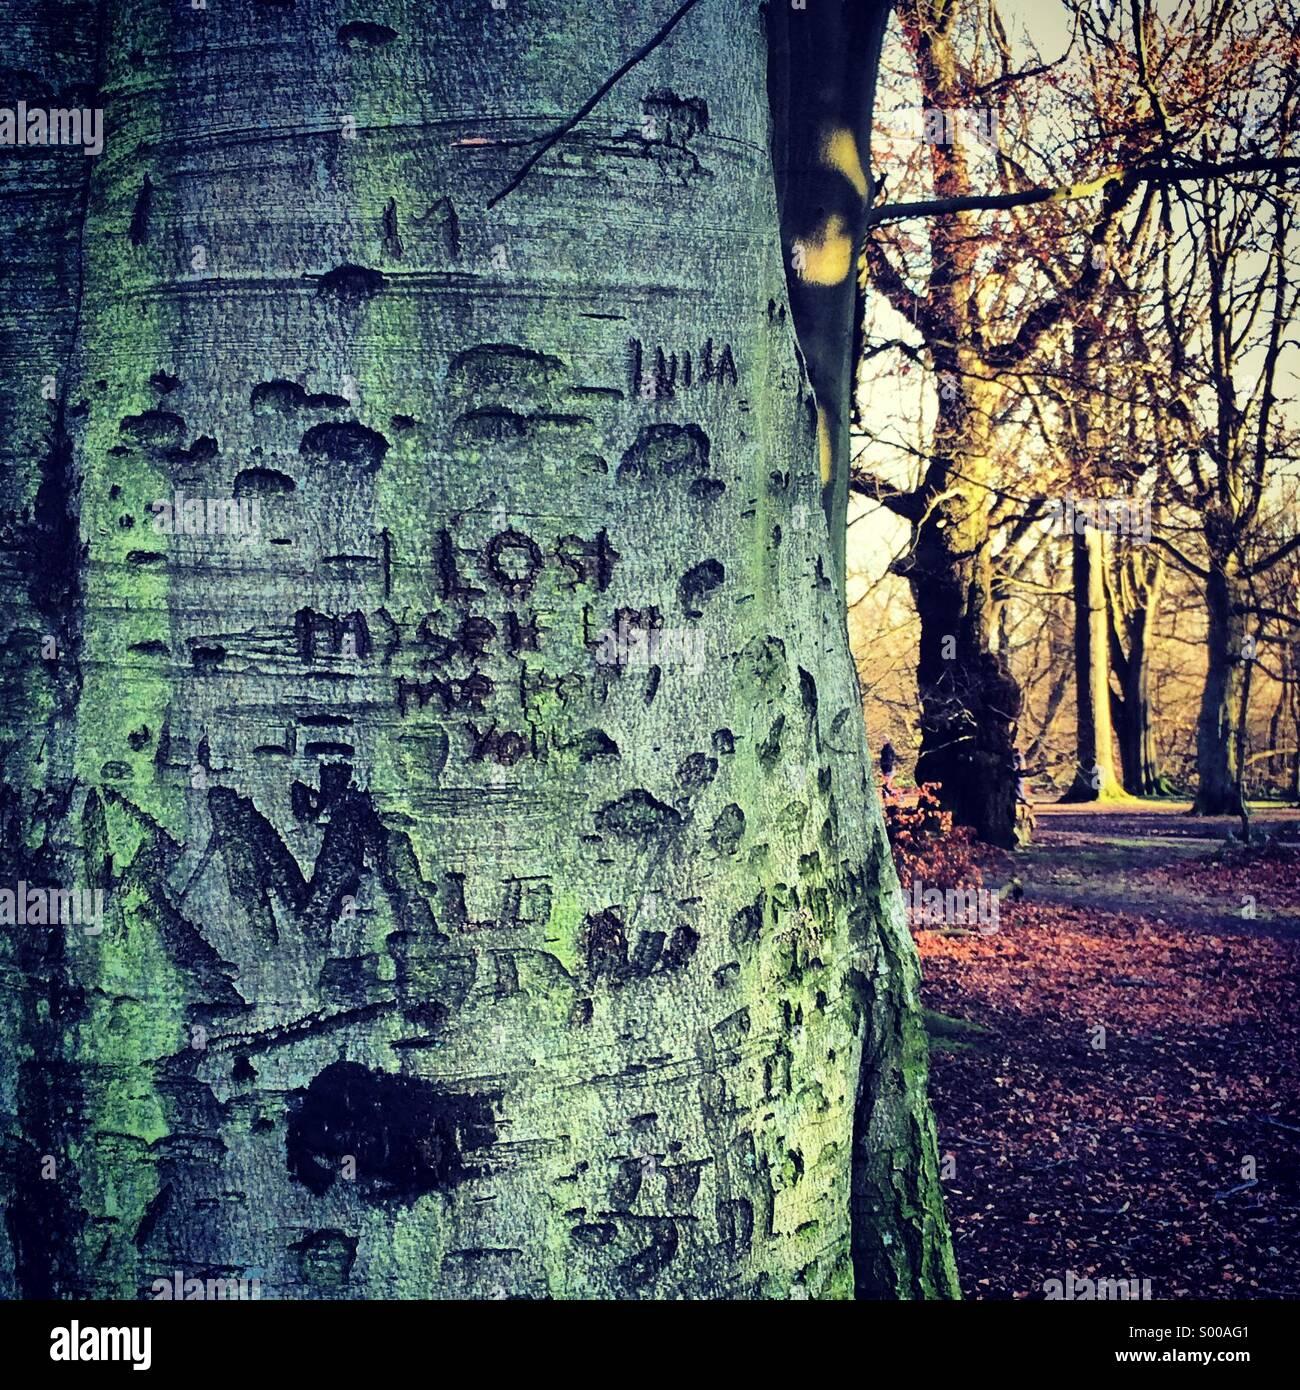 Tree carving at Hampstead Heath London - Stock Image